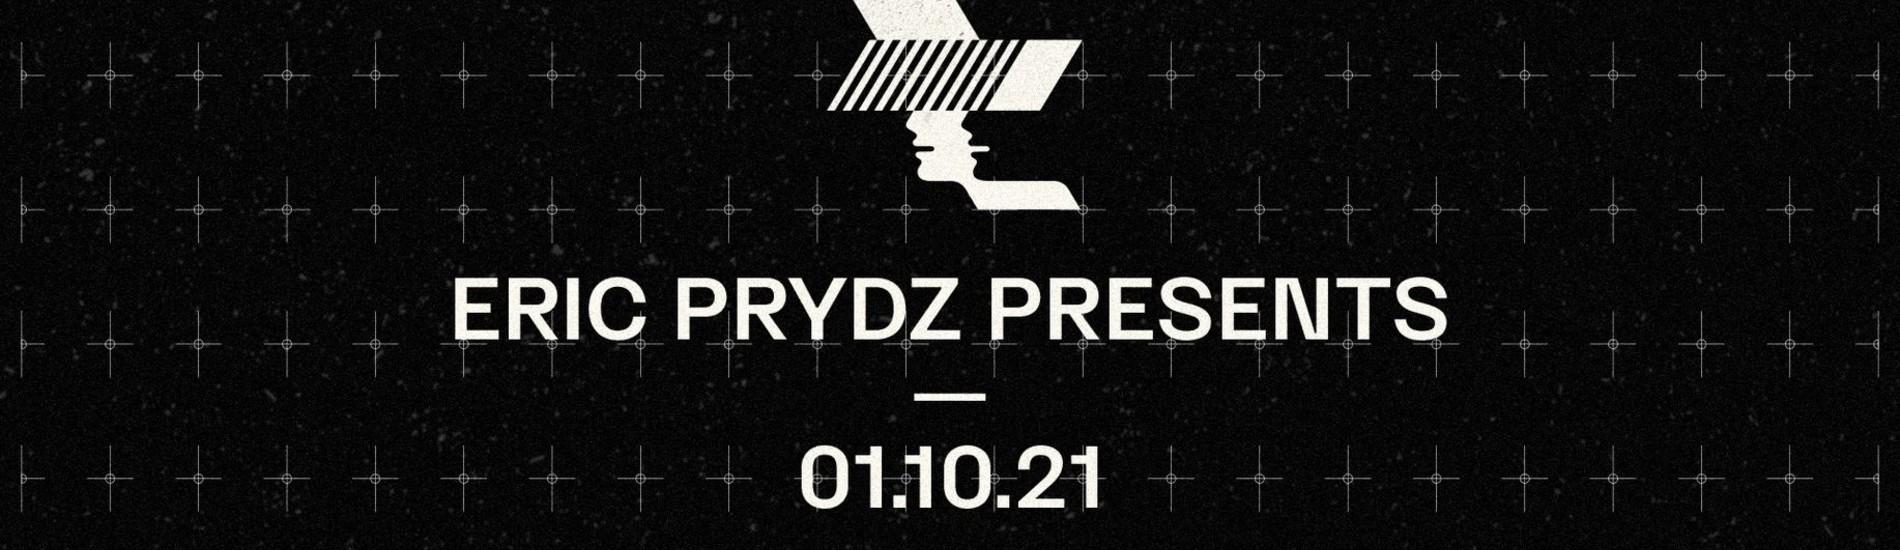 Eric Prydz Presents